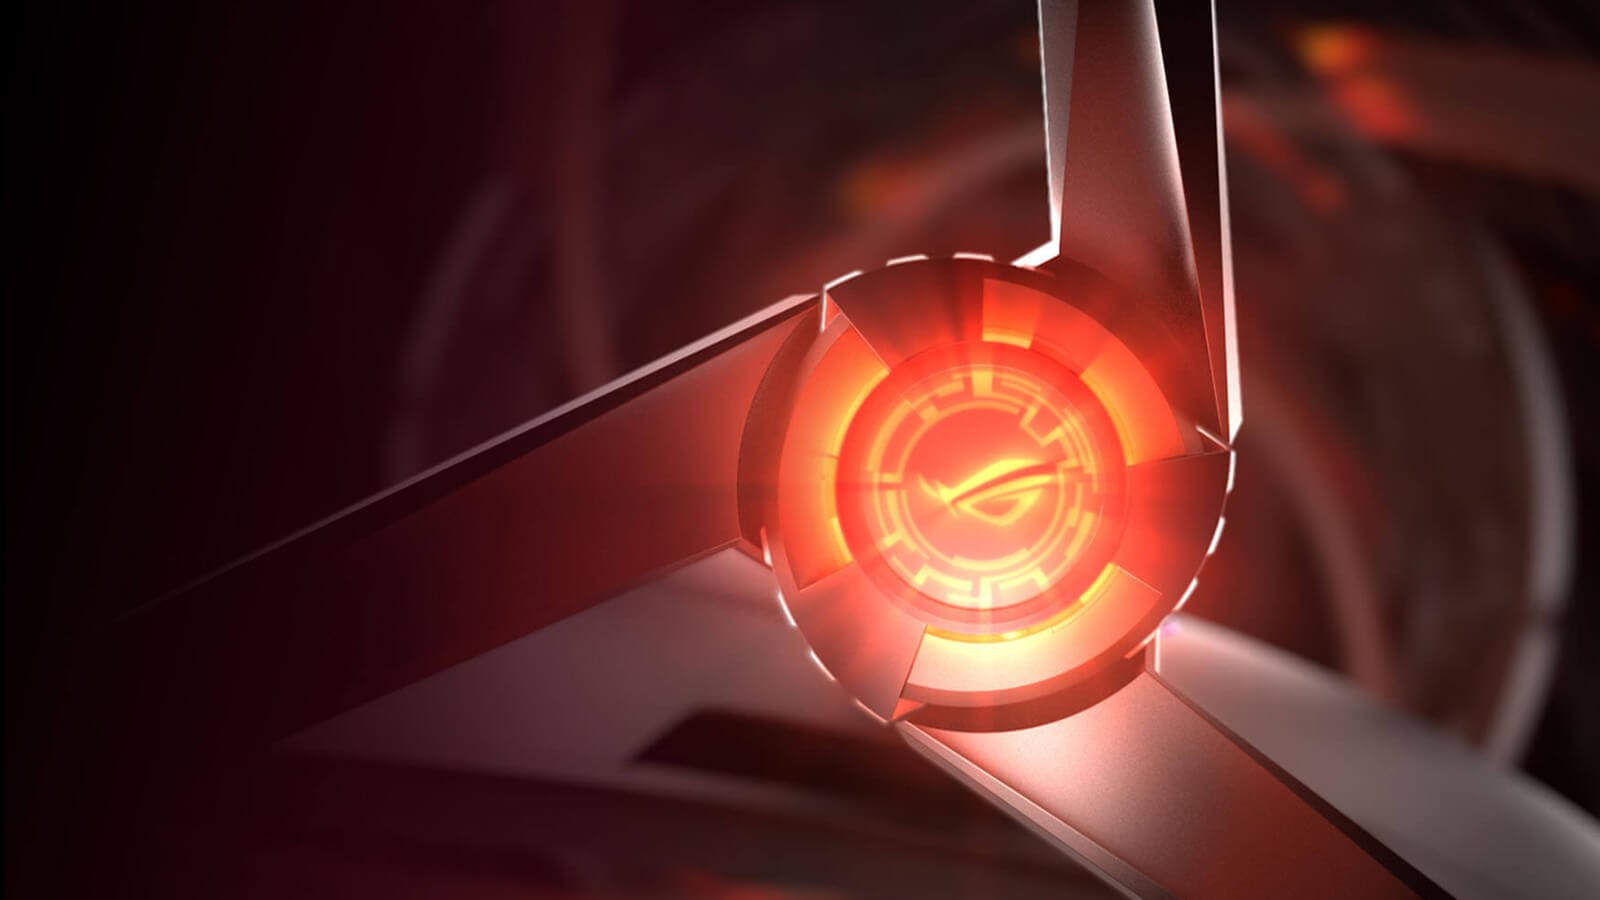 Asus Rog Strixxg27uq Gaming Monitor – Features 15